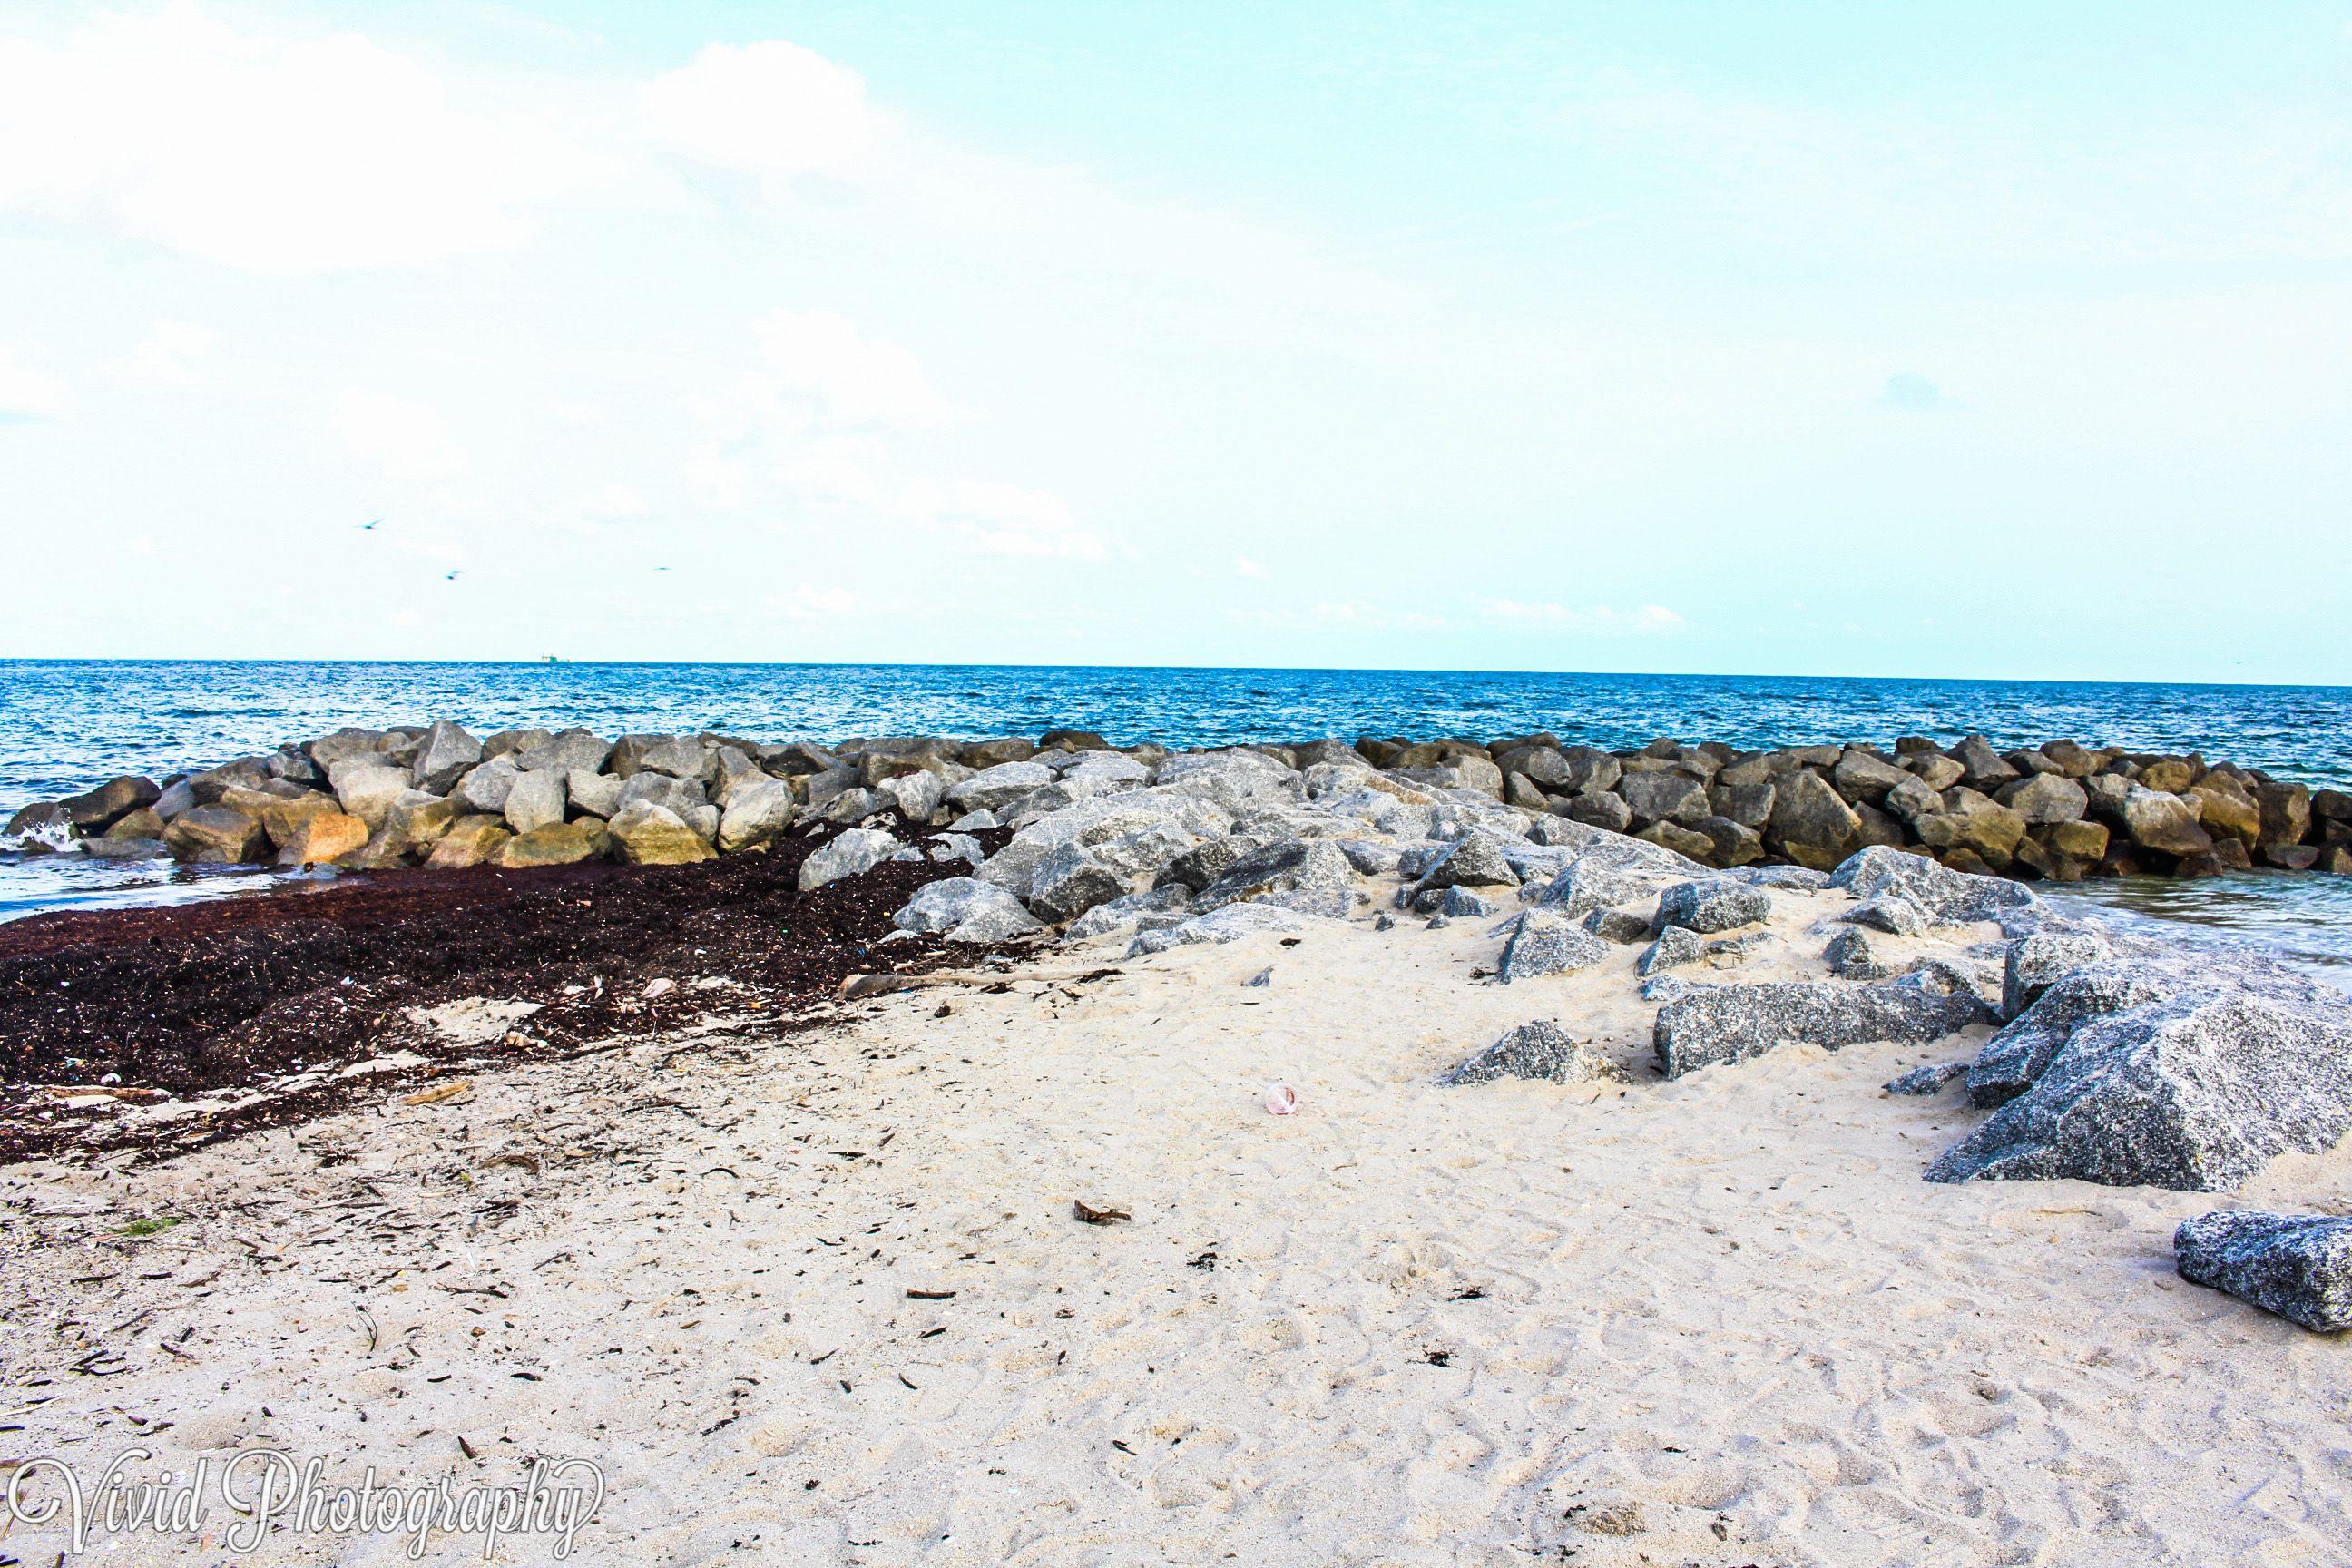 #Beach #daniabeach #sand #clearsky #ocean #ilivewhereyouvacation #florida #sunshine #photo #photoshoot #vivid #photography #create #capture #transform #throughtheseeyes #dslr #canon #eos #rebel #t5i #throughthislens